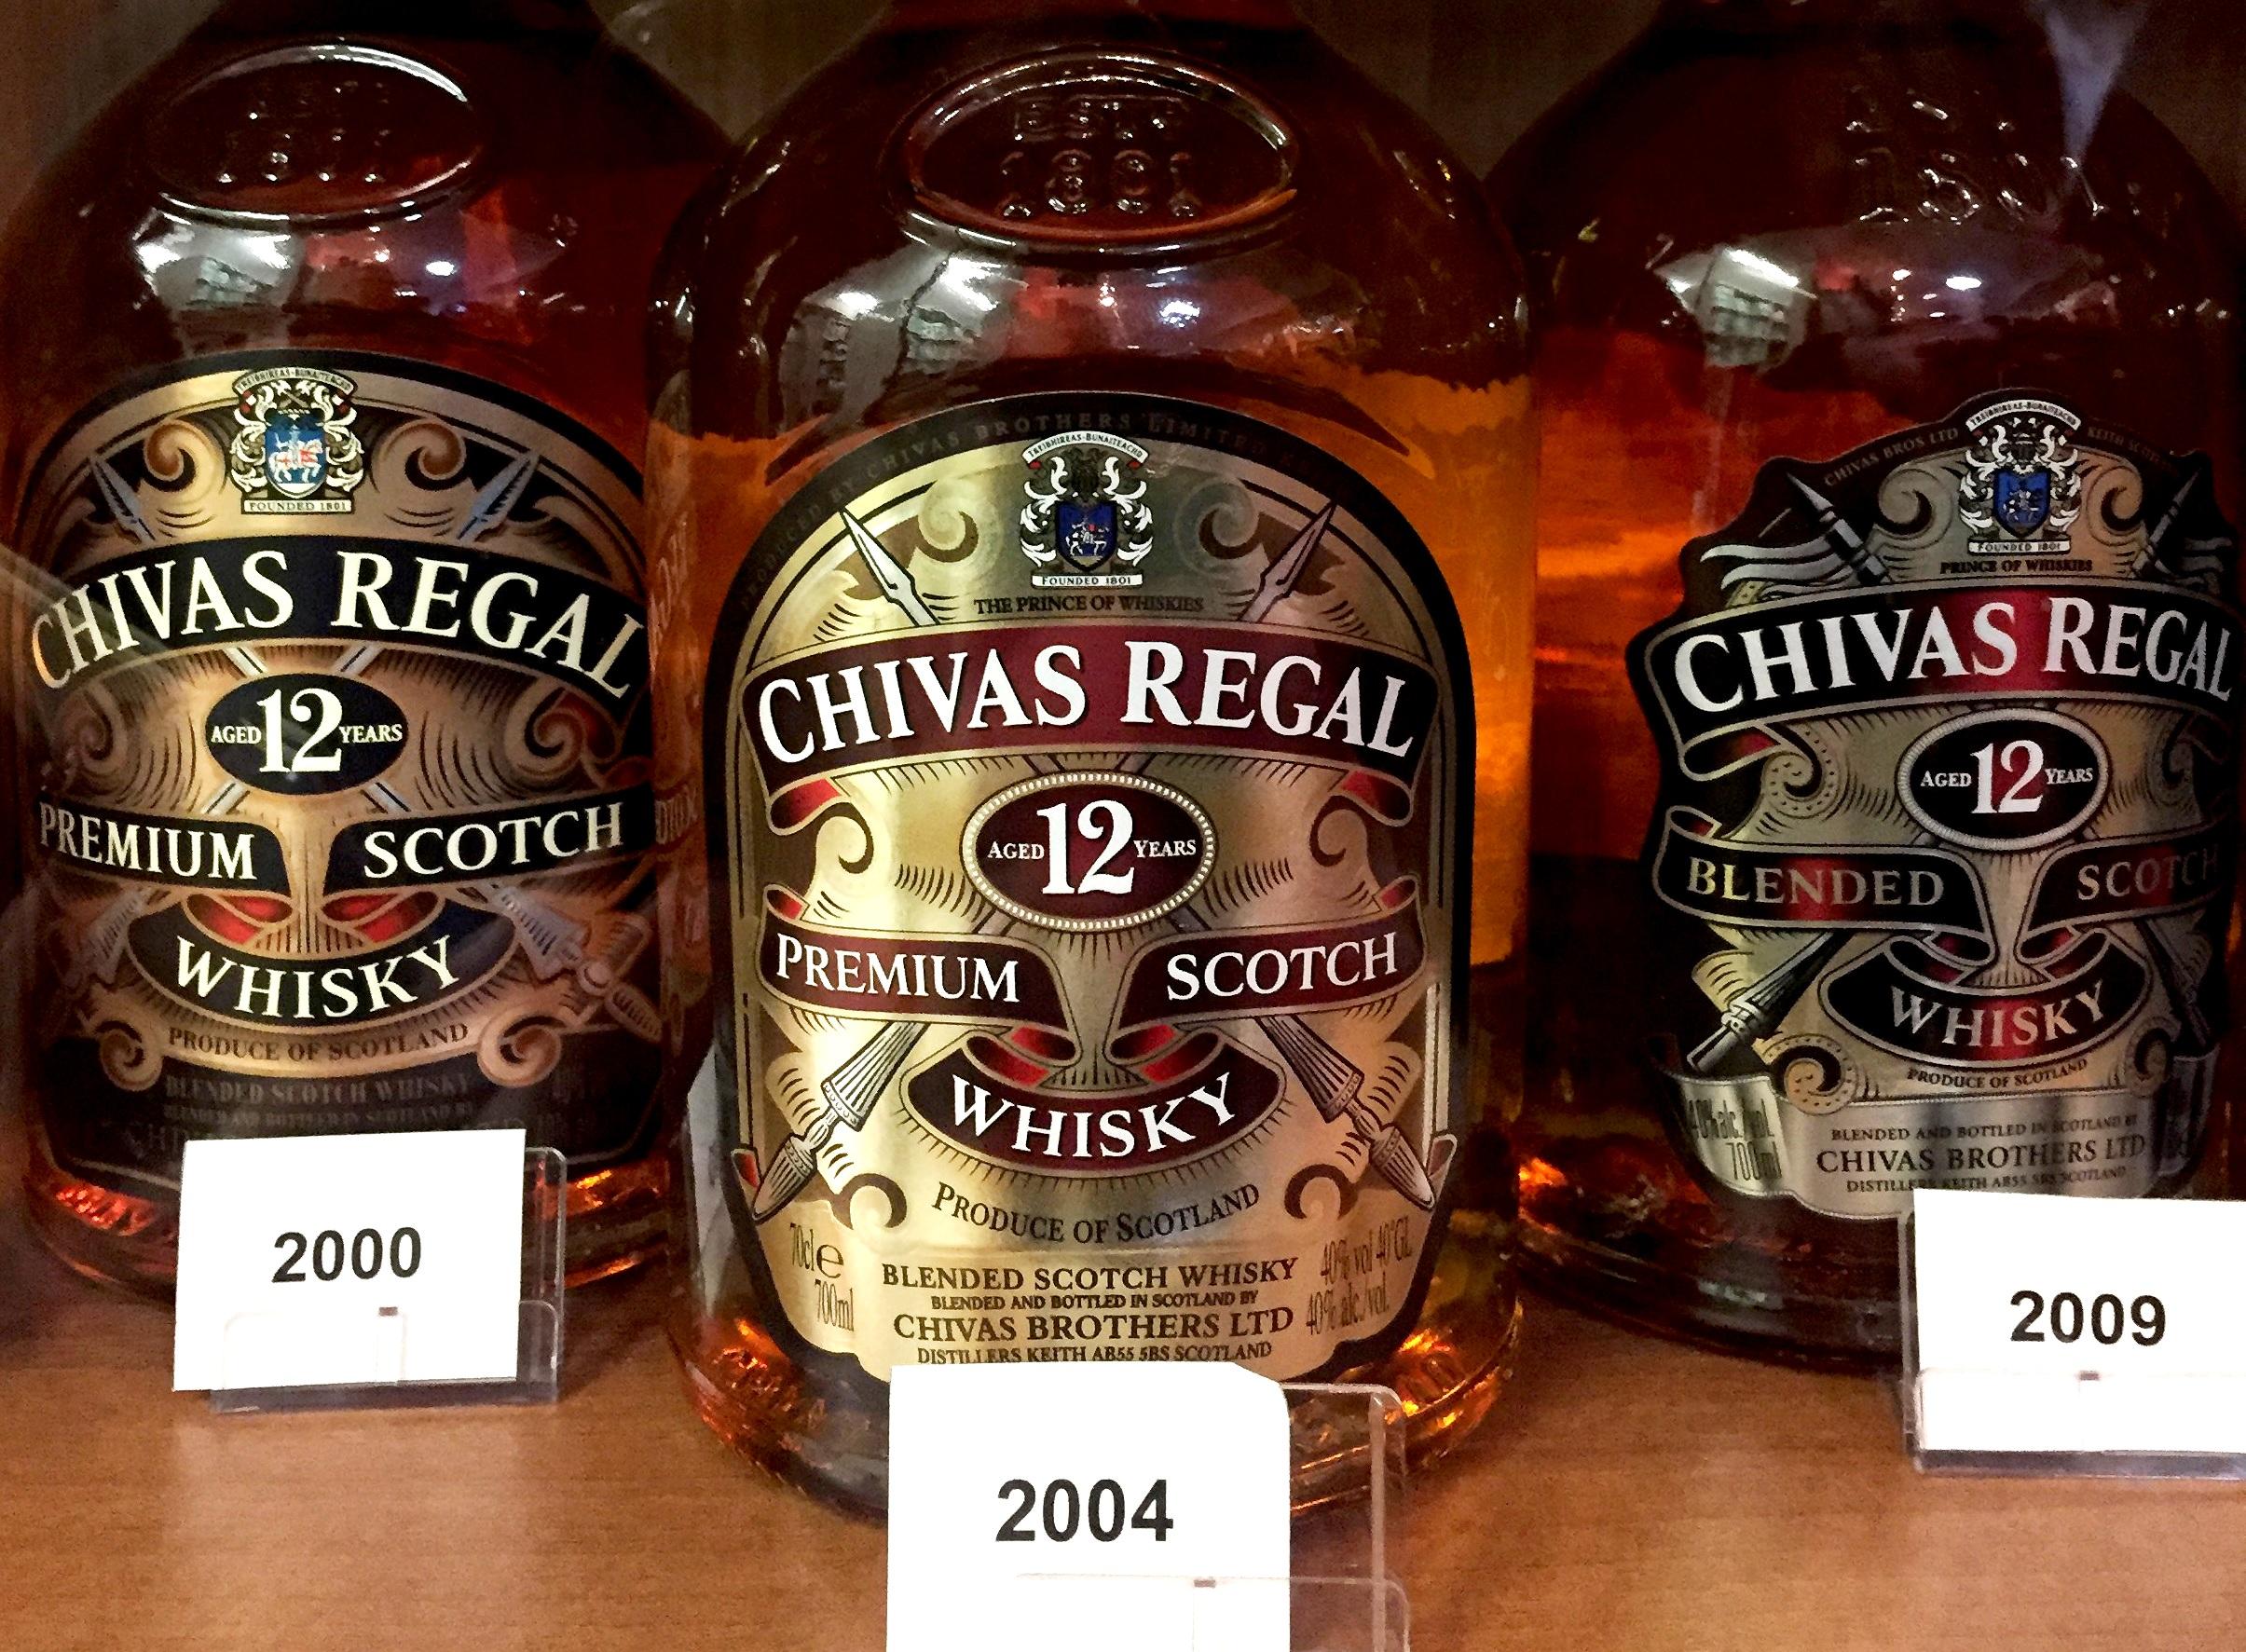 Chivas Regal Whisky Archive_4.jpg